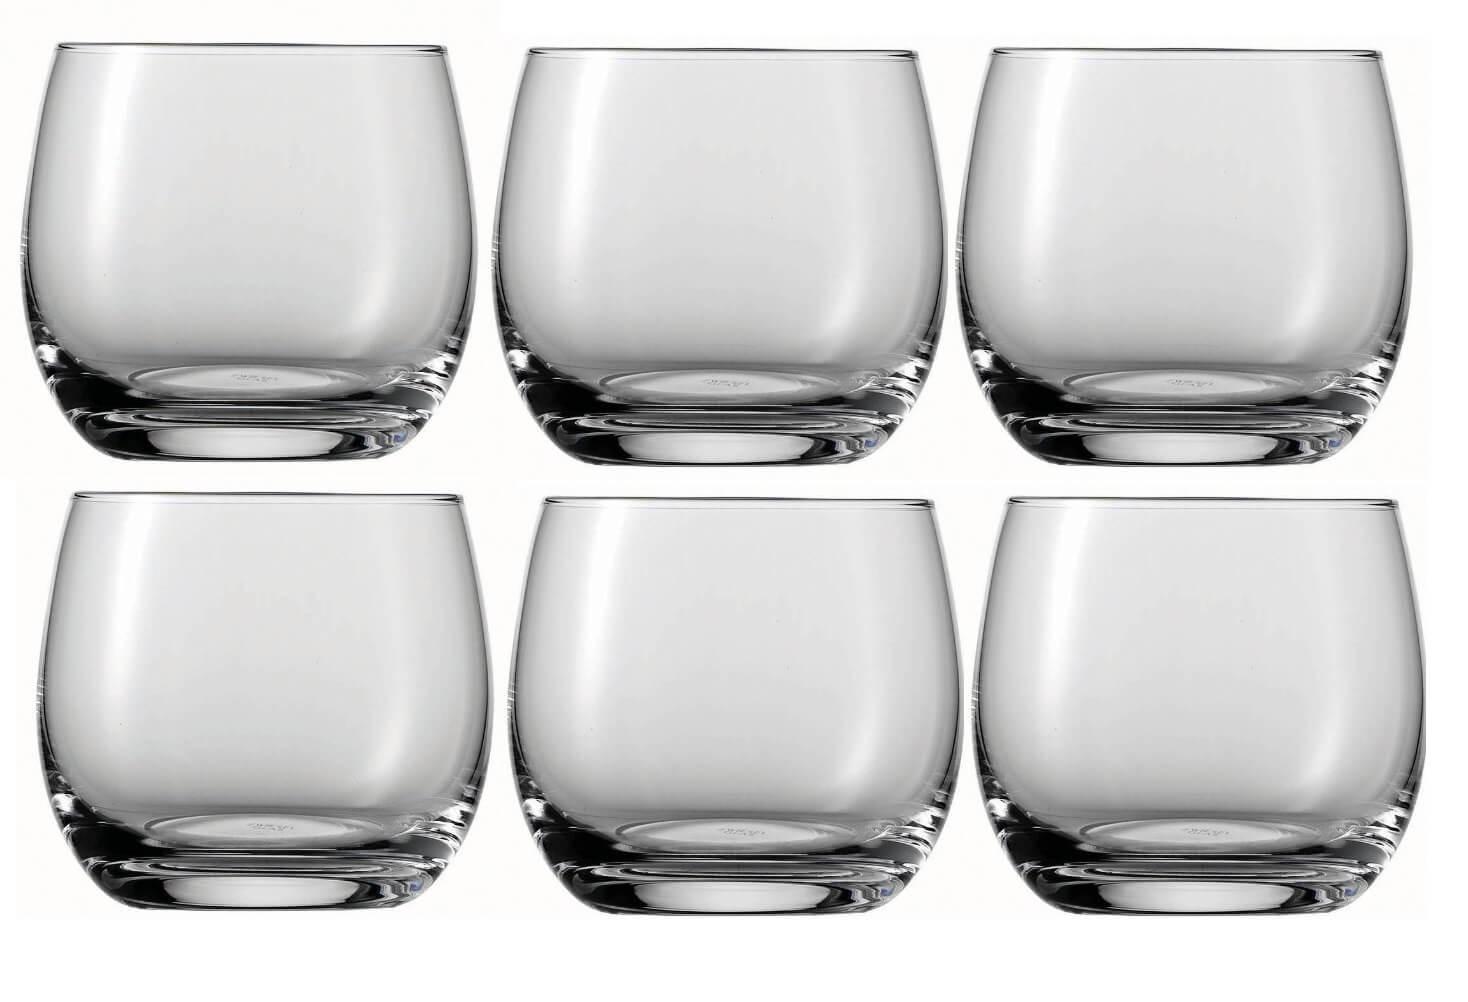 Онлайн каталог PROMENU: Набор стаканов для виски Schott Zwiesel Banquet, объем  0,4 л, 6 шт.                               128075_6шт